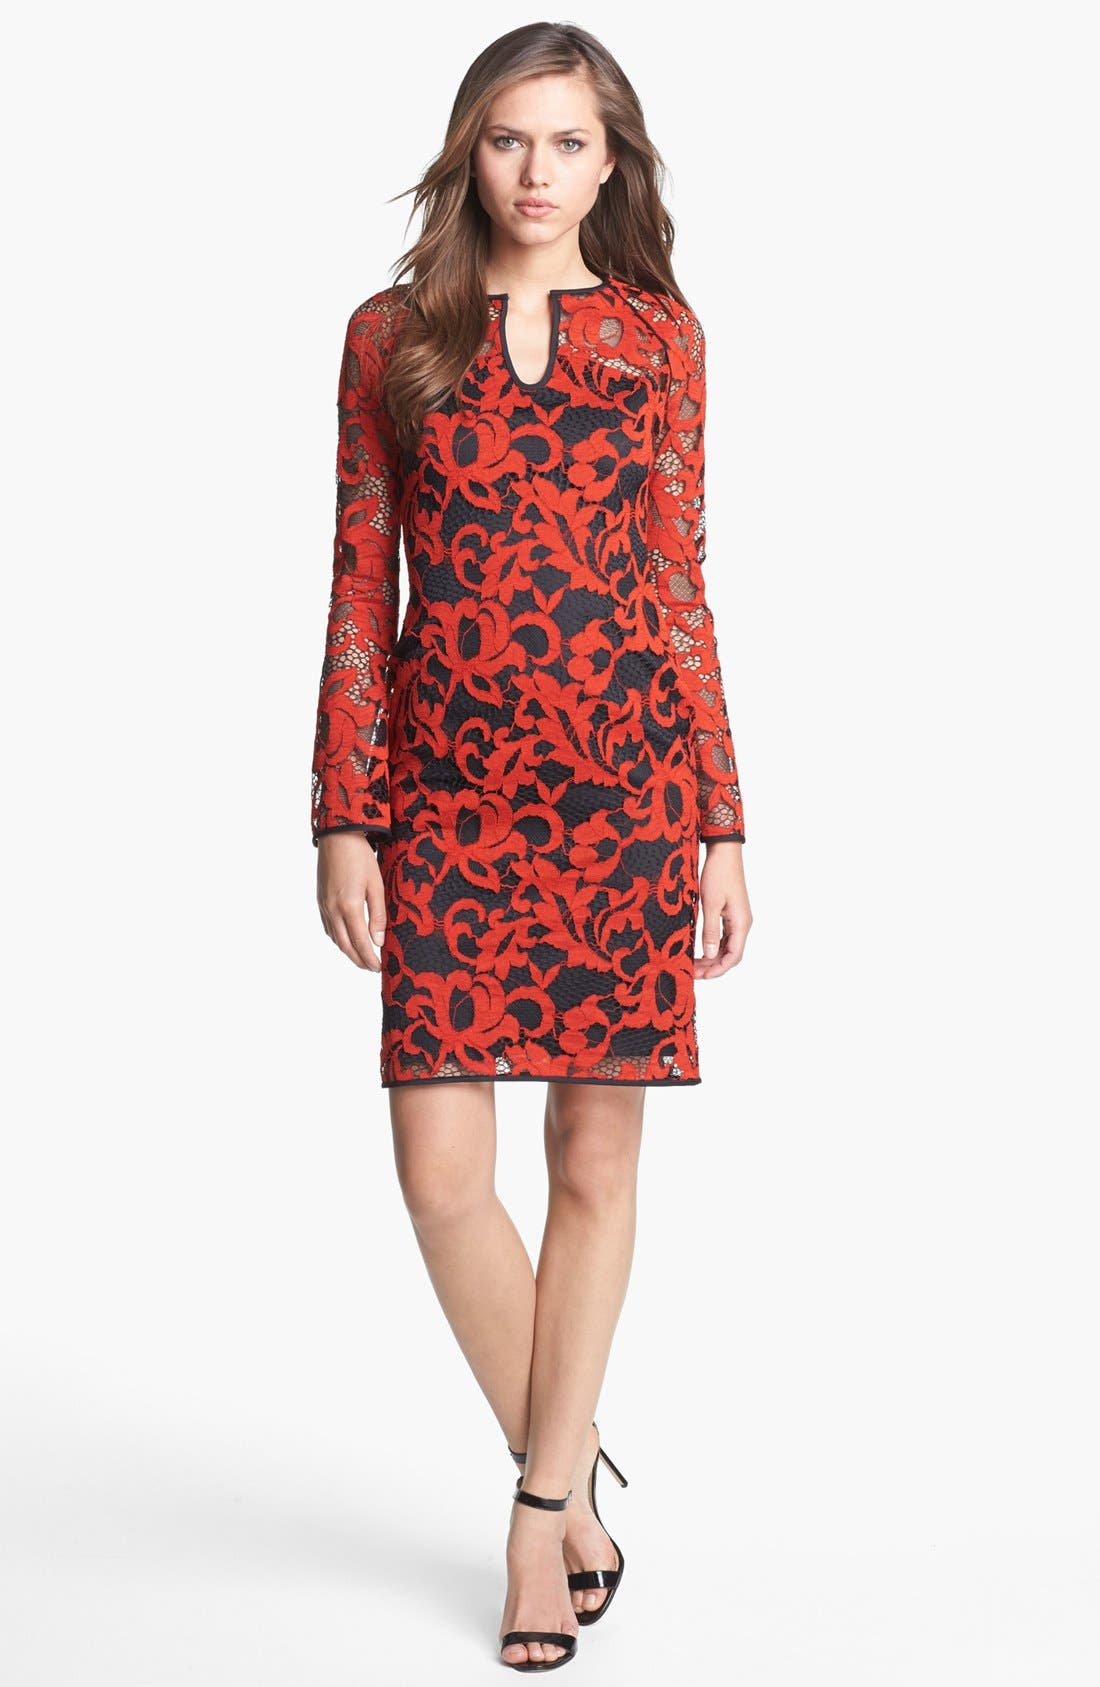 Alternate Image 1 Selected - Diane von Furstenberg 'Gadie' Lace Shift Dress